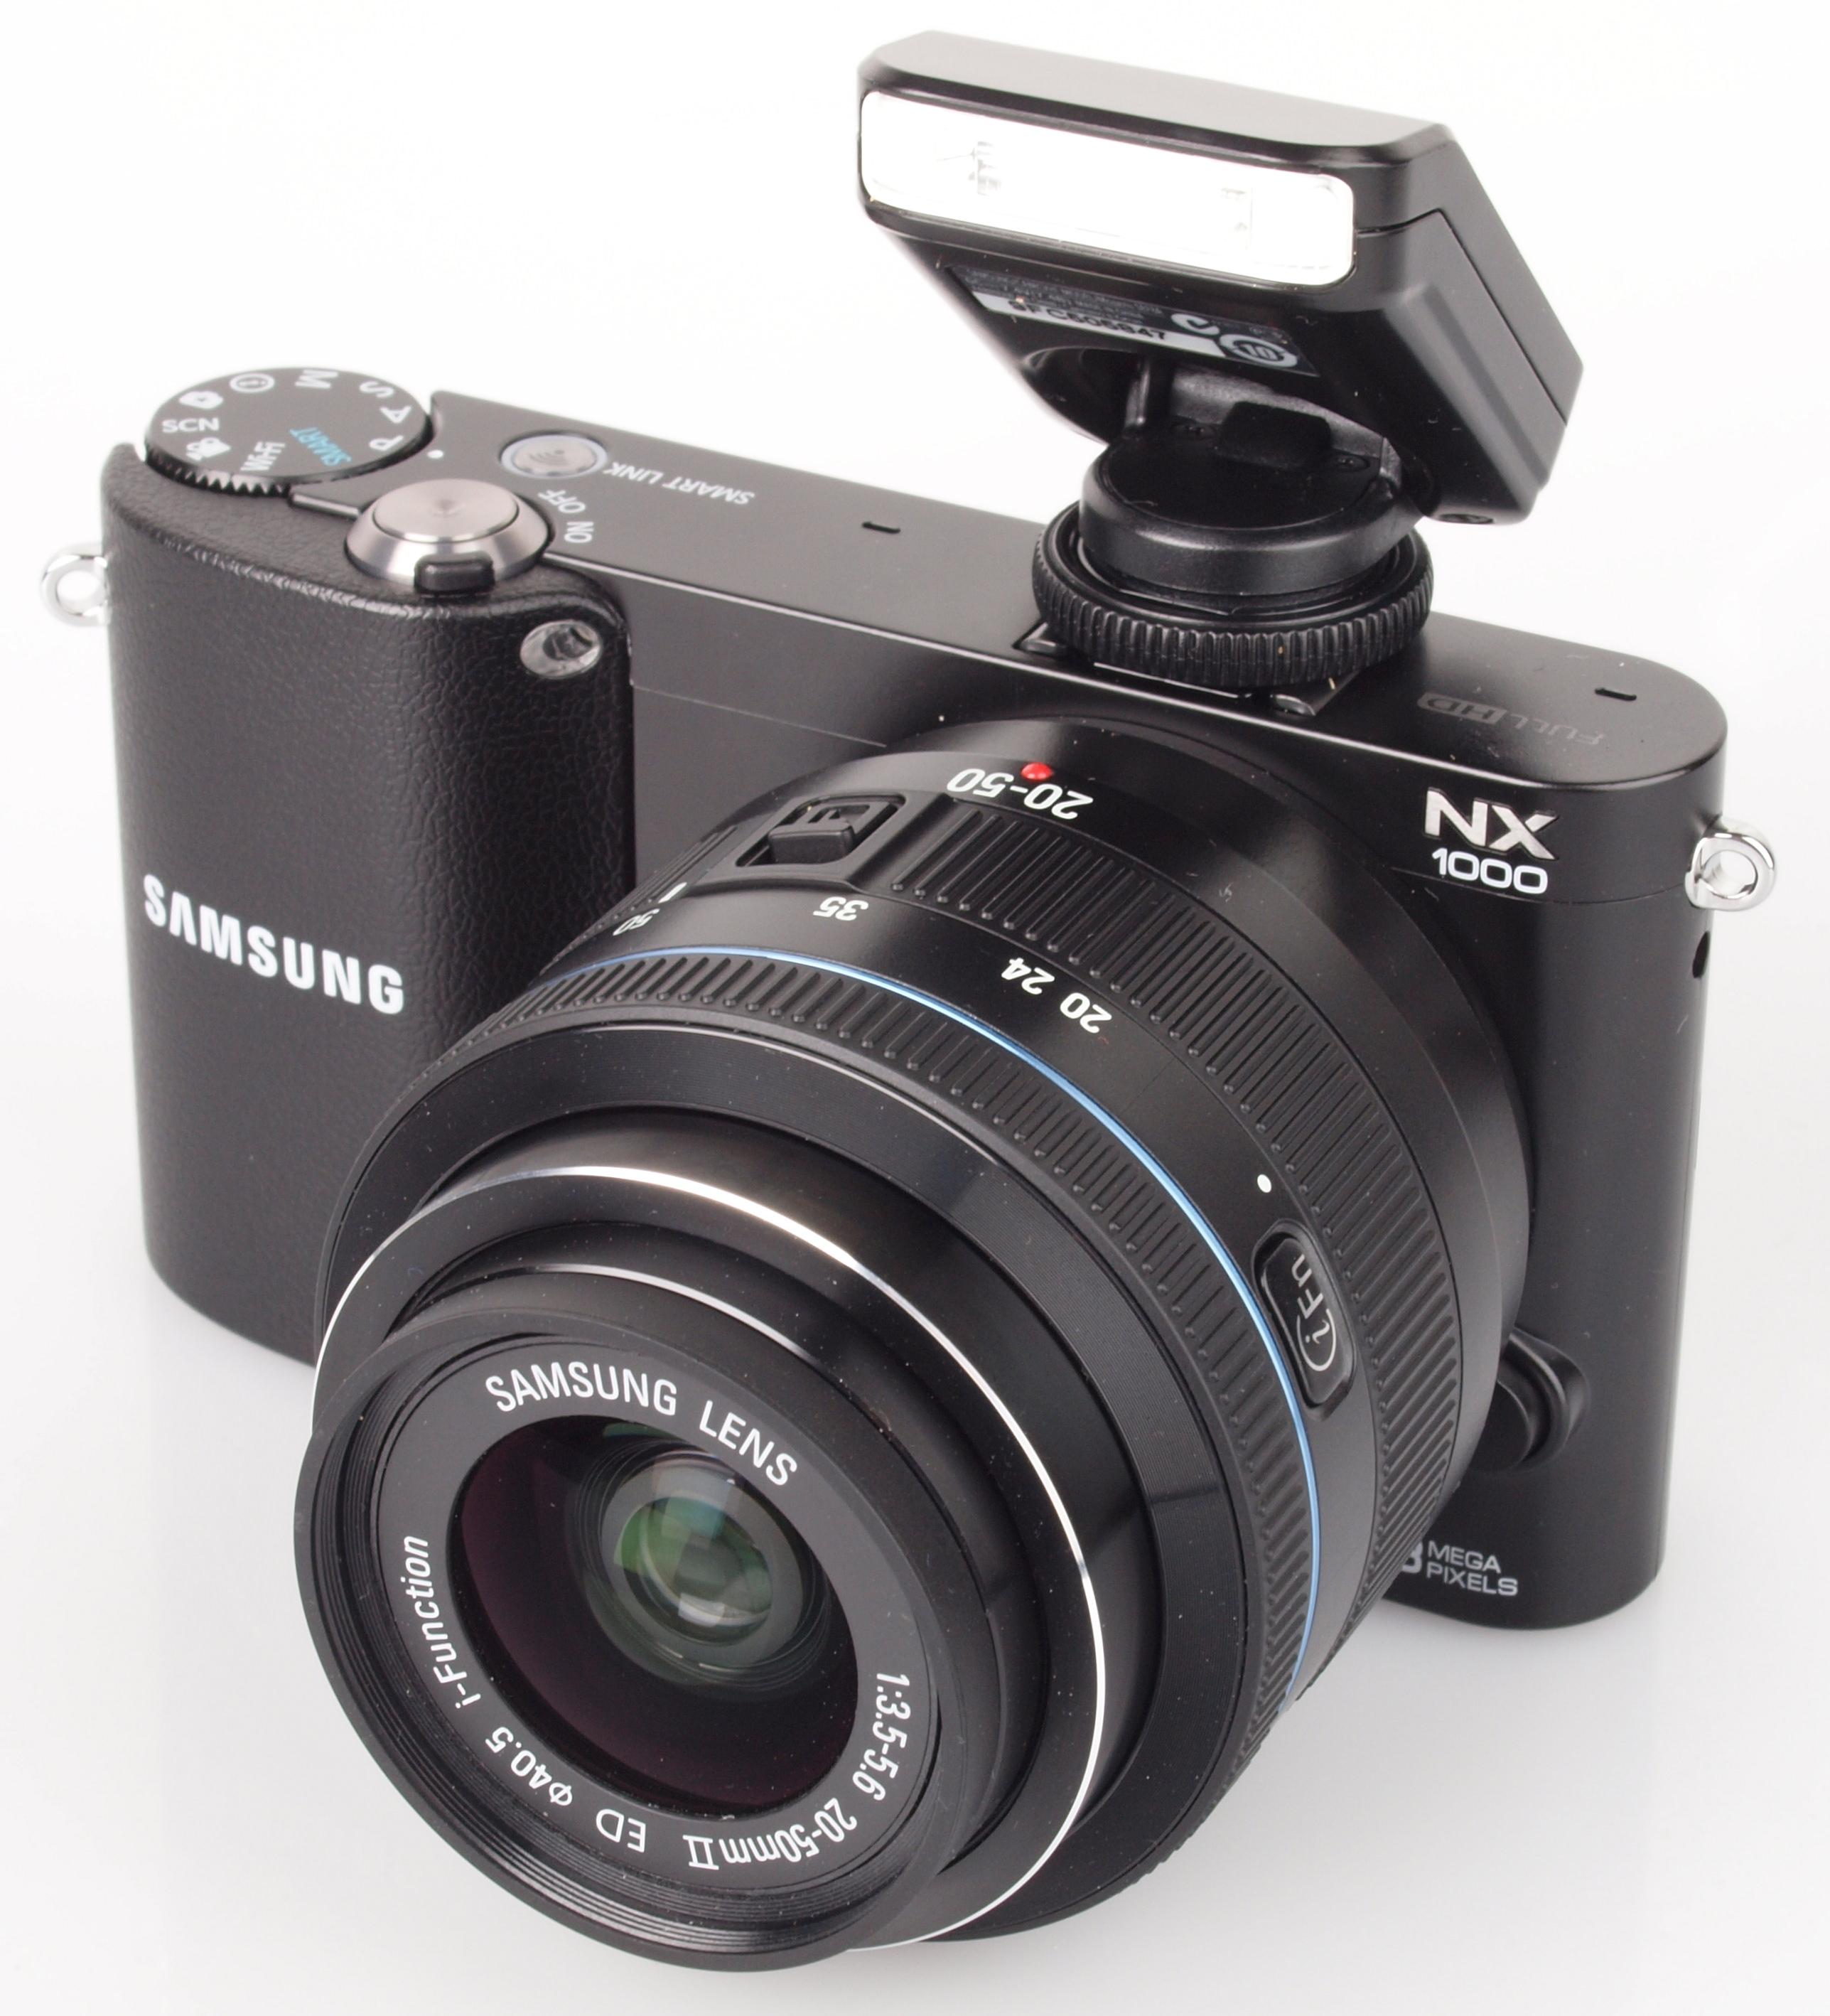 samsung nx 1000 manual focus tips